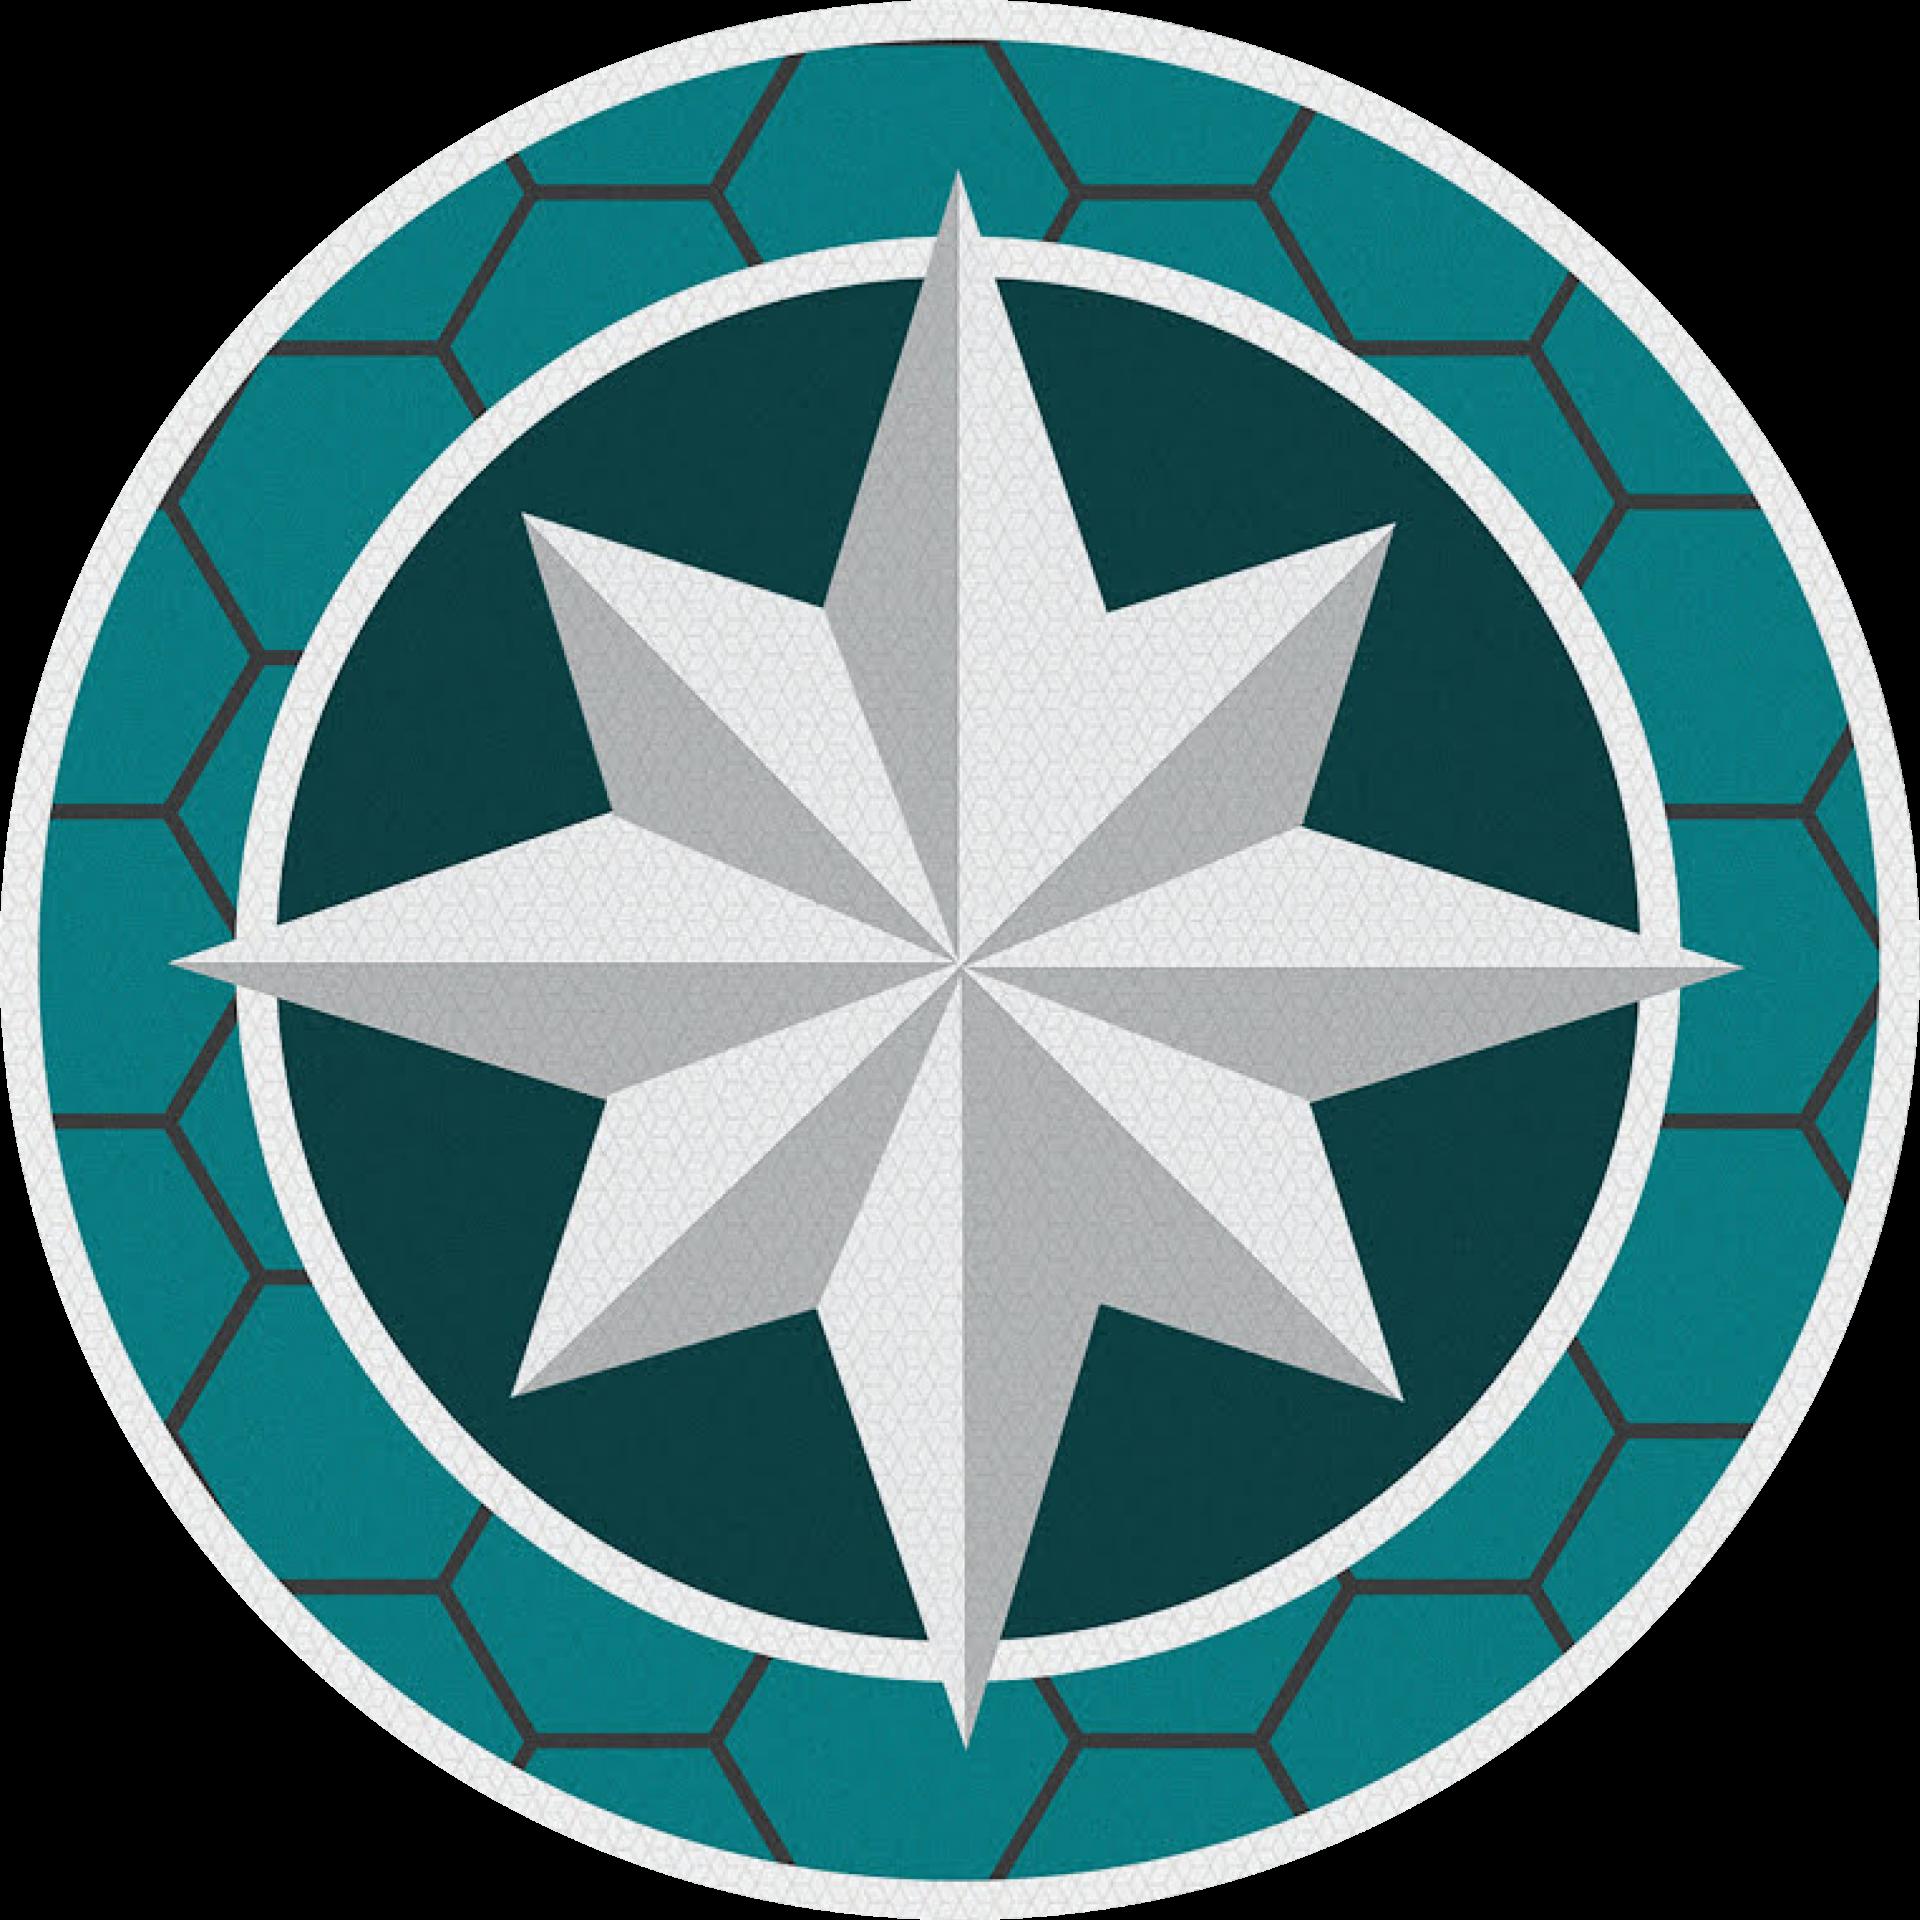 Starforcesymbole